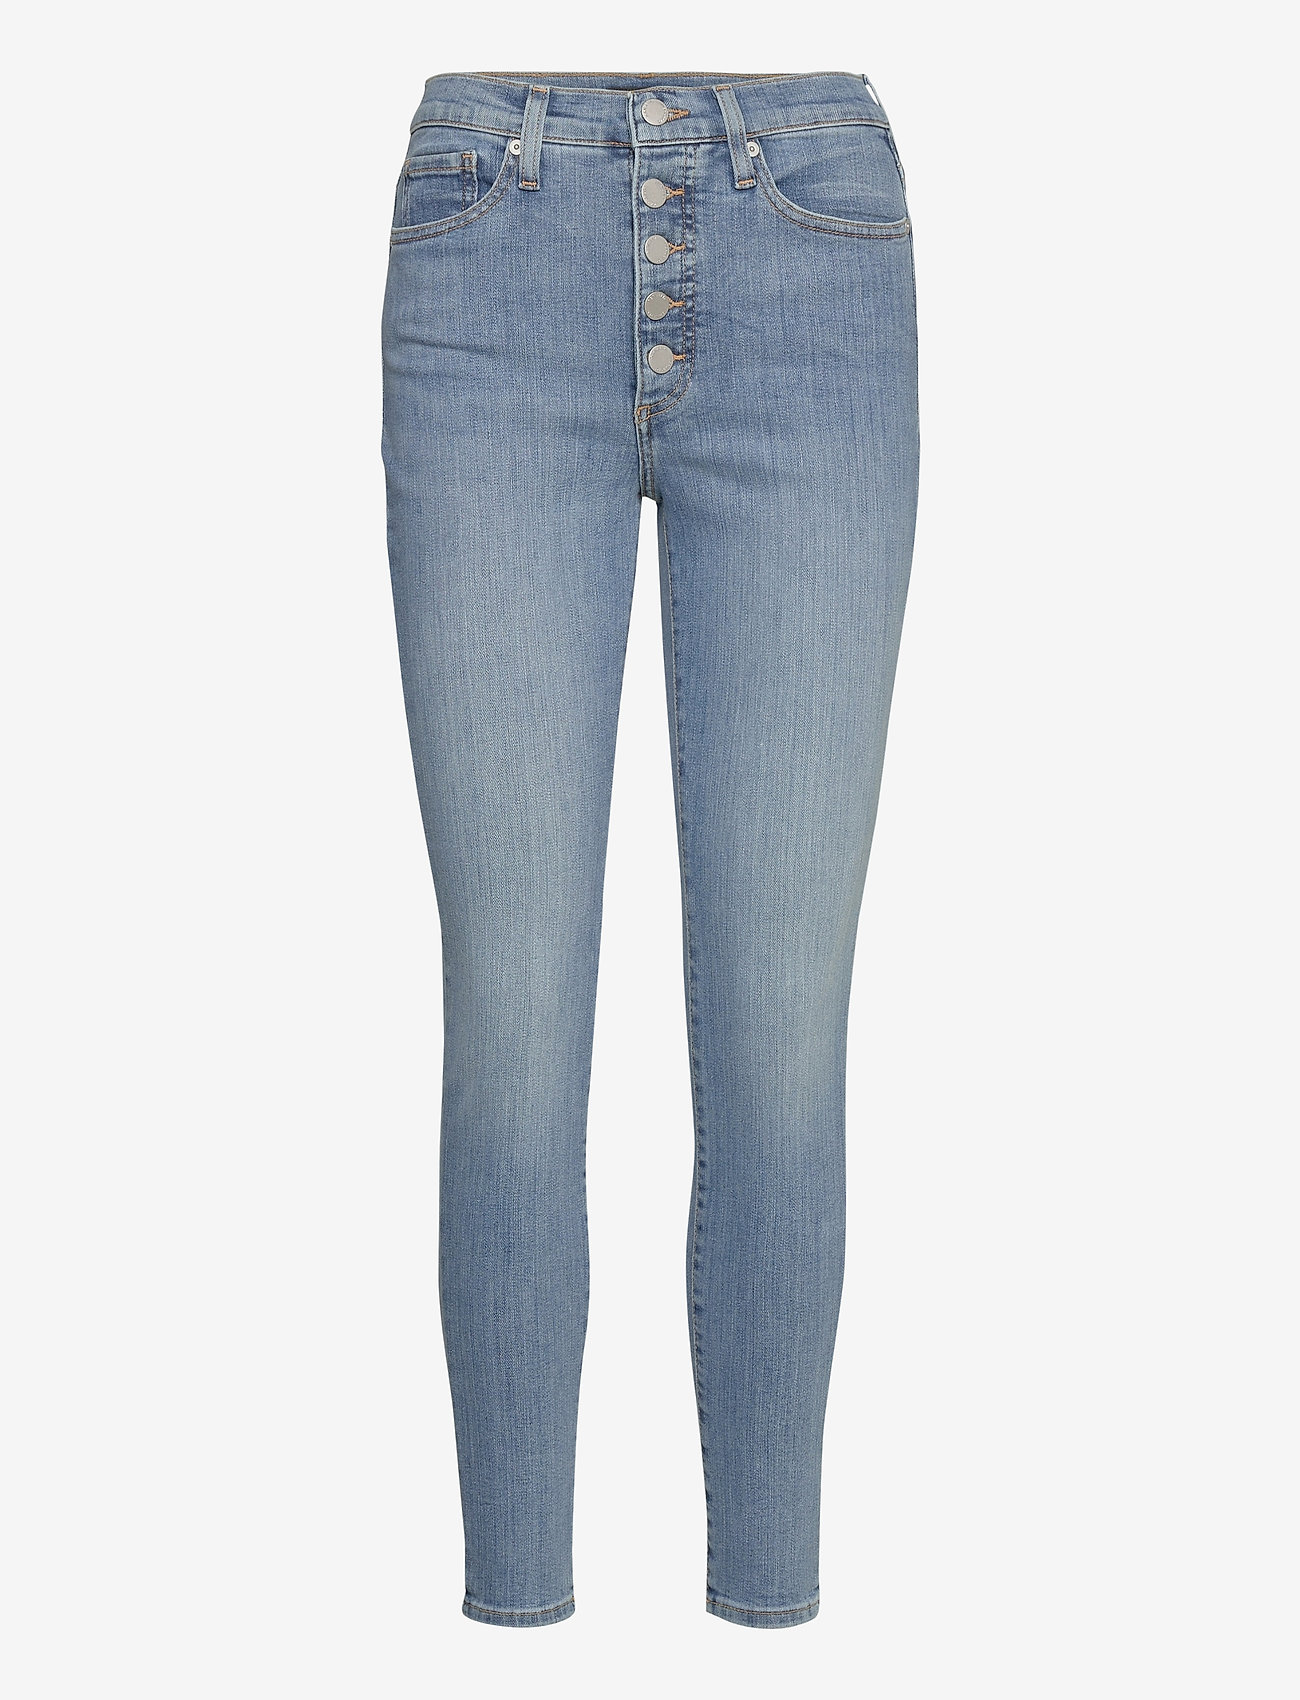 Banana Republic - High-Rise Skinny Button-Fly Jean - slim jeans - medium wash - 0